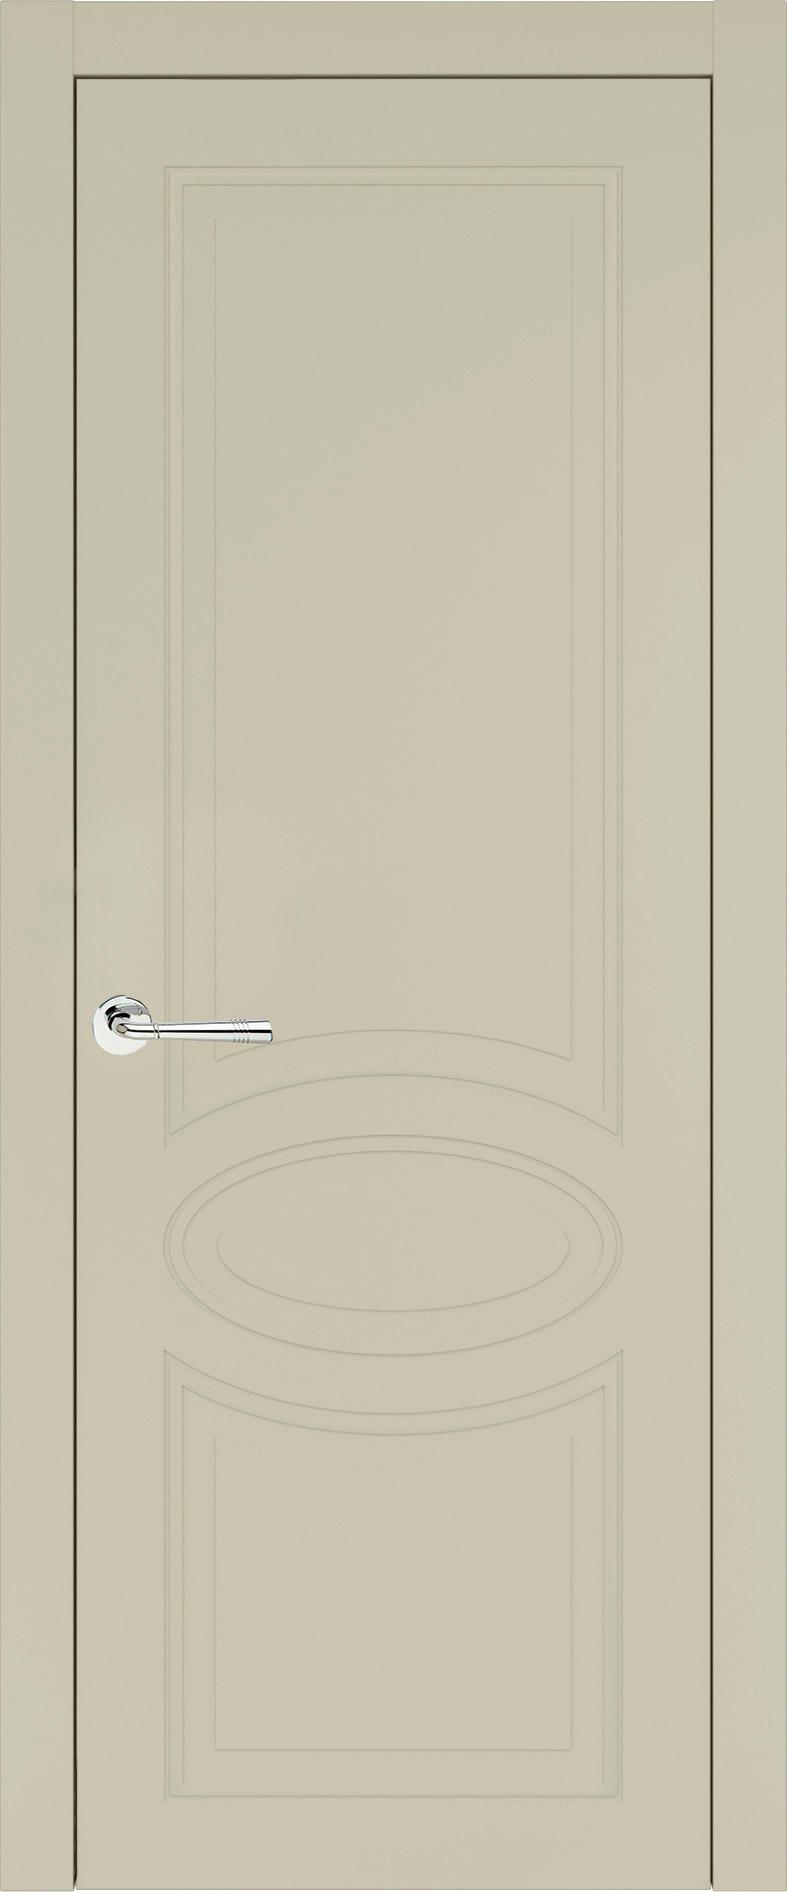 Florencia Neo Classic цвет - Серо-оливковая эмаль (RAL 7032) Без стекла (ДГ)